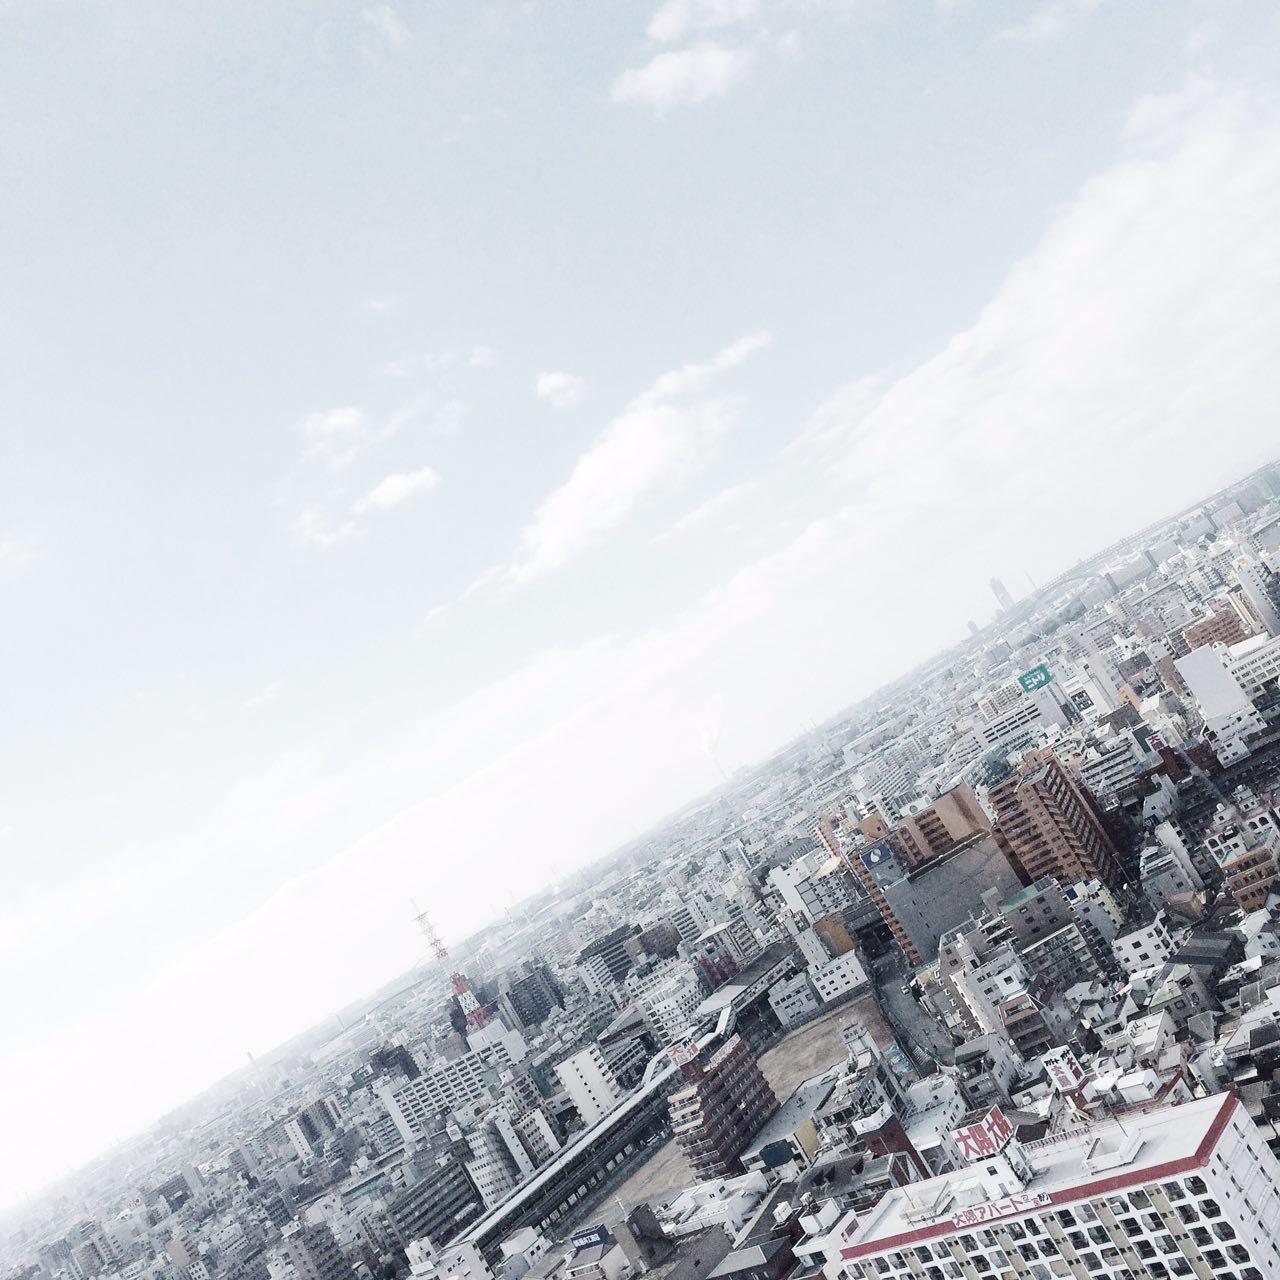 IMG_2015-12-04 13_58_40.jpg